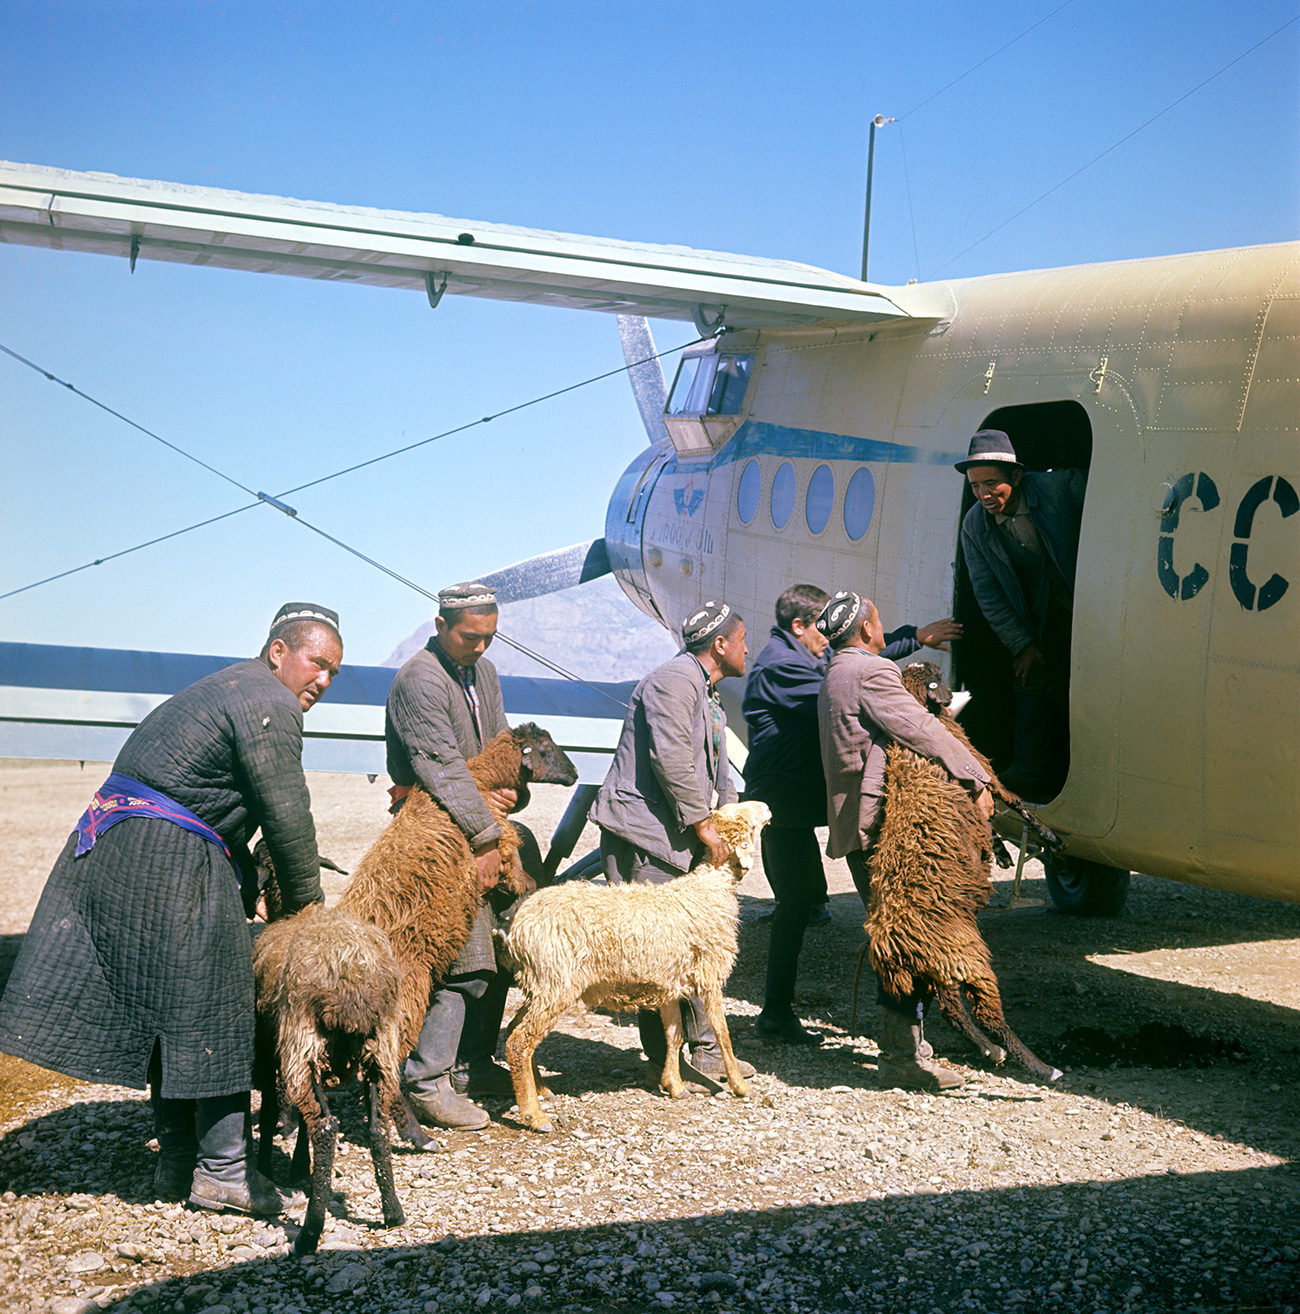 An-2、ウズベク・ソビエト社会主義共和国、 1967年=E.ヴィルチンスキイ/ロシア通信